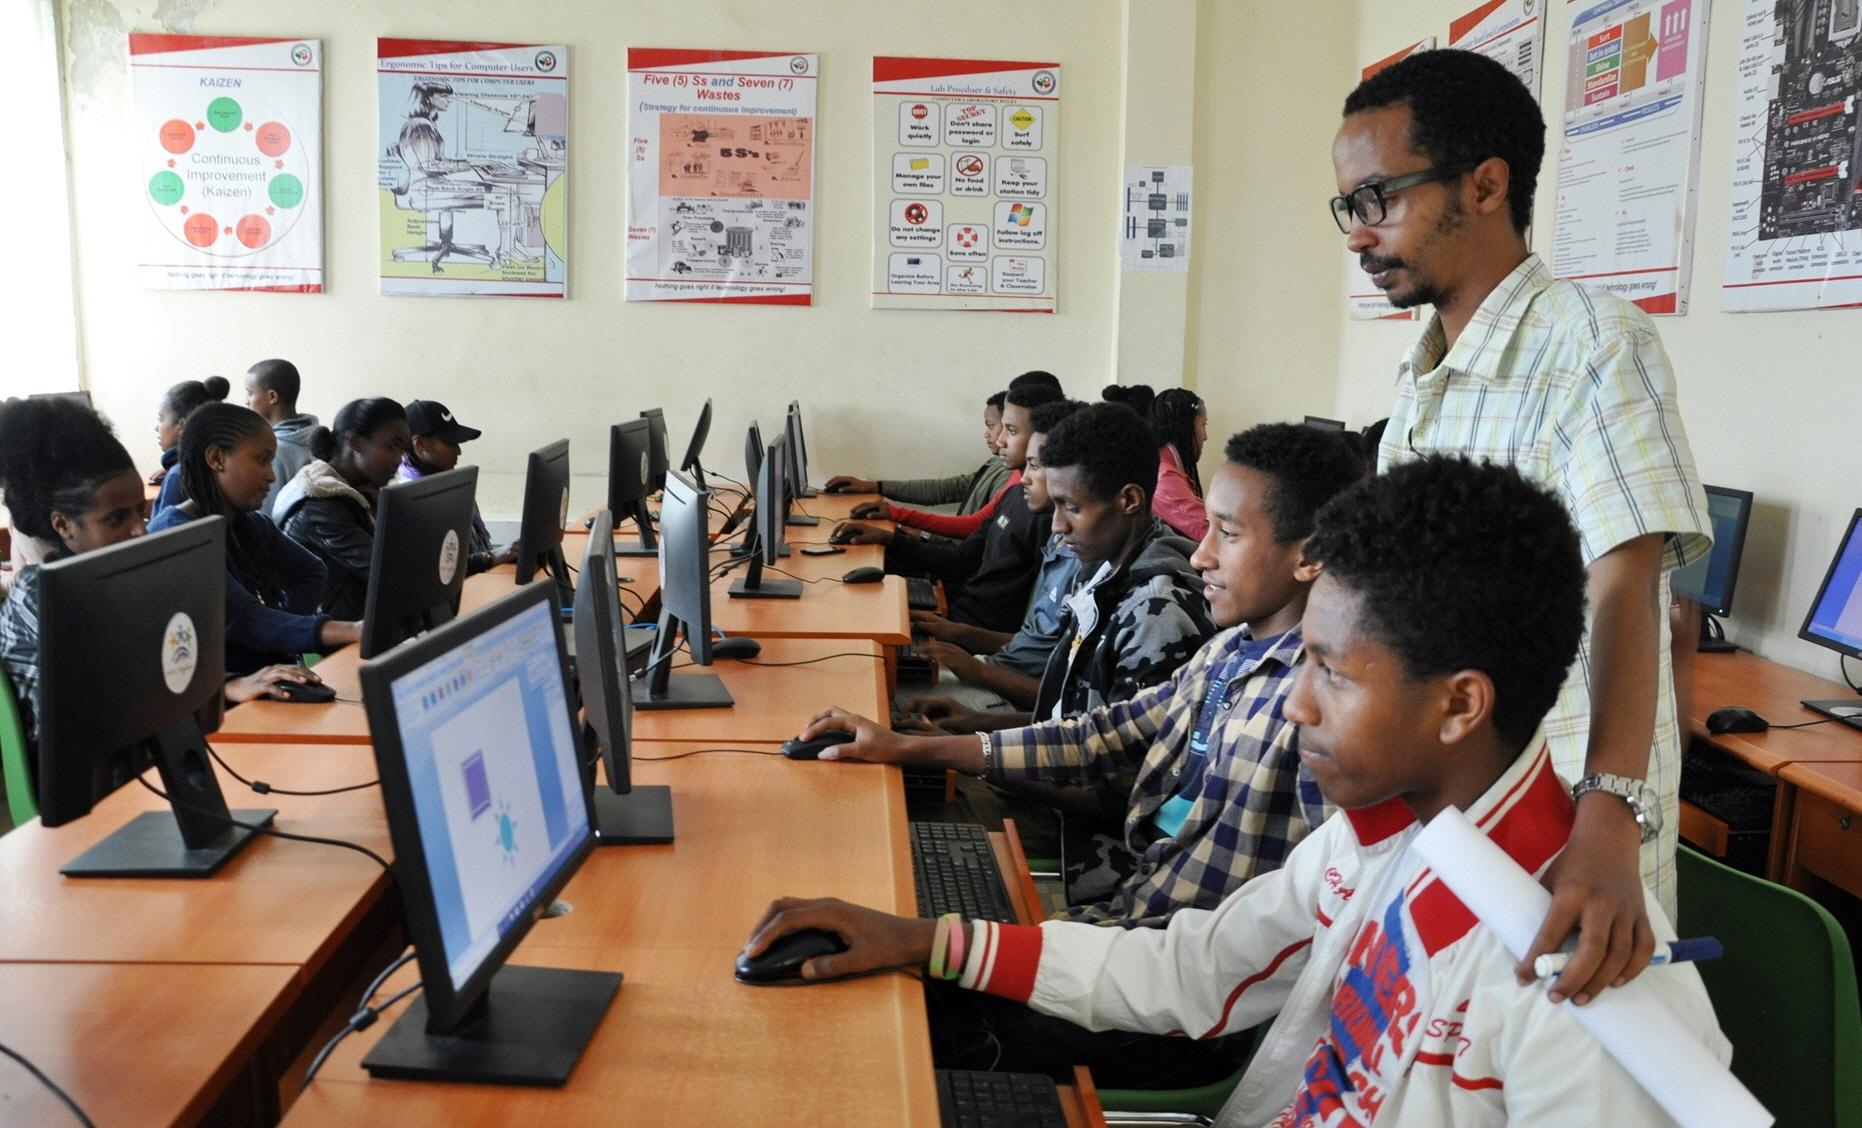 LG전자가 지난 달 중순부터 이달 5일까지 총 6회에 걸쳐 에티오피아 참전용사 후손 30여 명을 대상으로 한글 수업을 진행했다. 또 LG-KOICA 희망직업훈련학교의 최신 컴퓨터를 이용해 윈도우, 워드, 엑셀 등 컴퓨터 기초교육도 함께 실시했다.사진은 에티오피아 참전용사 후손들이 컴퓨터 기초교육을 받고 있는 모습.